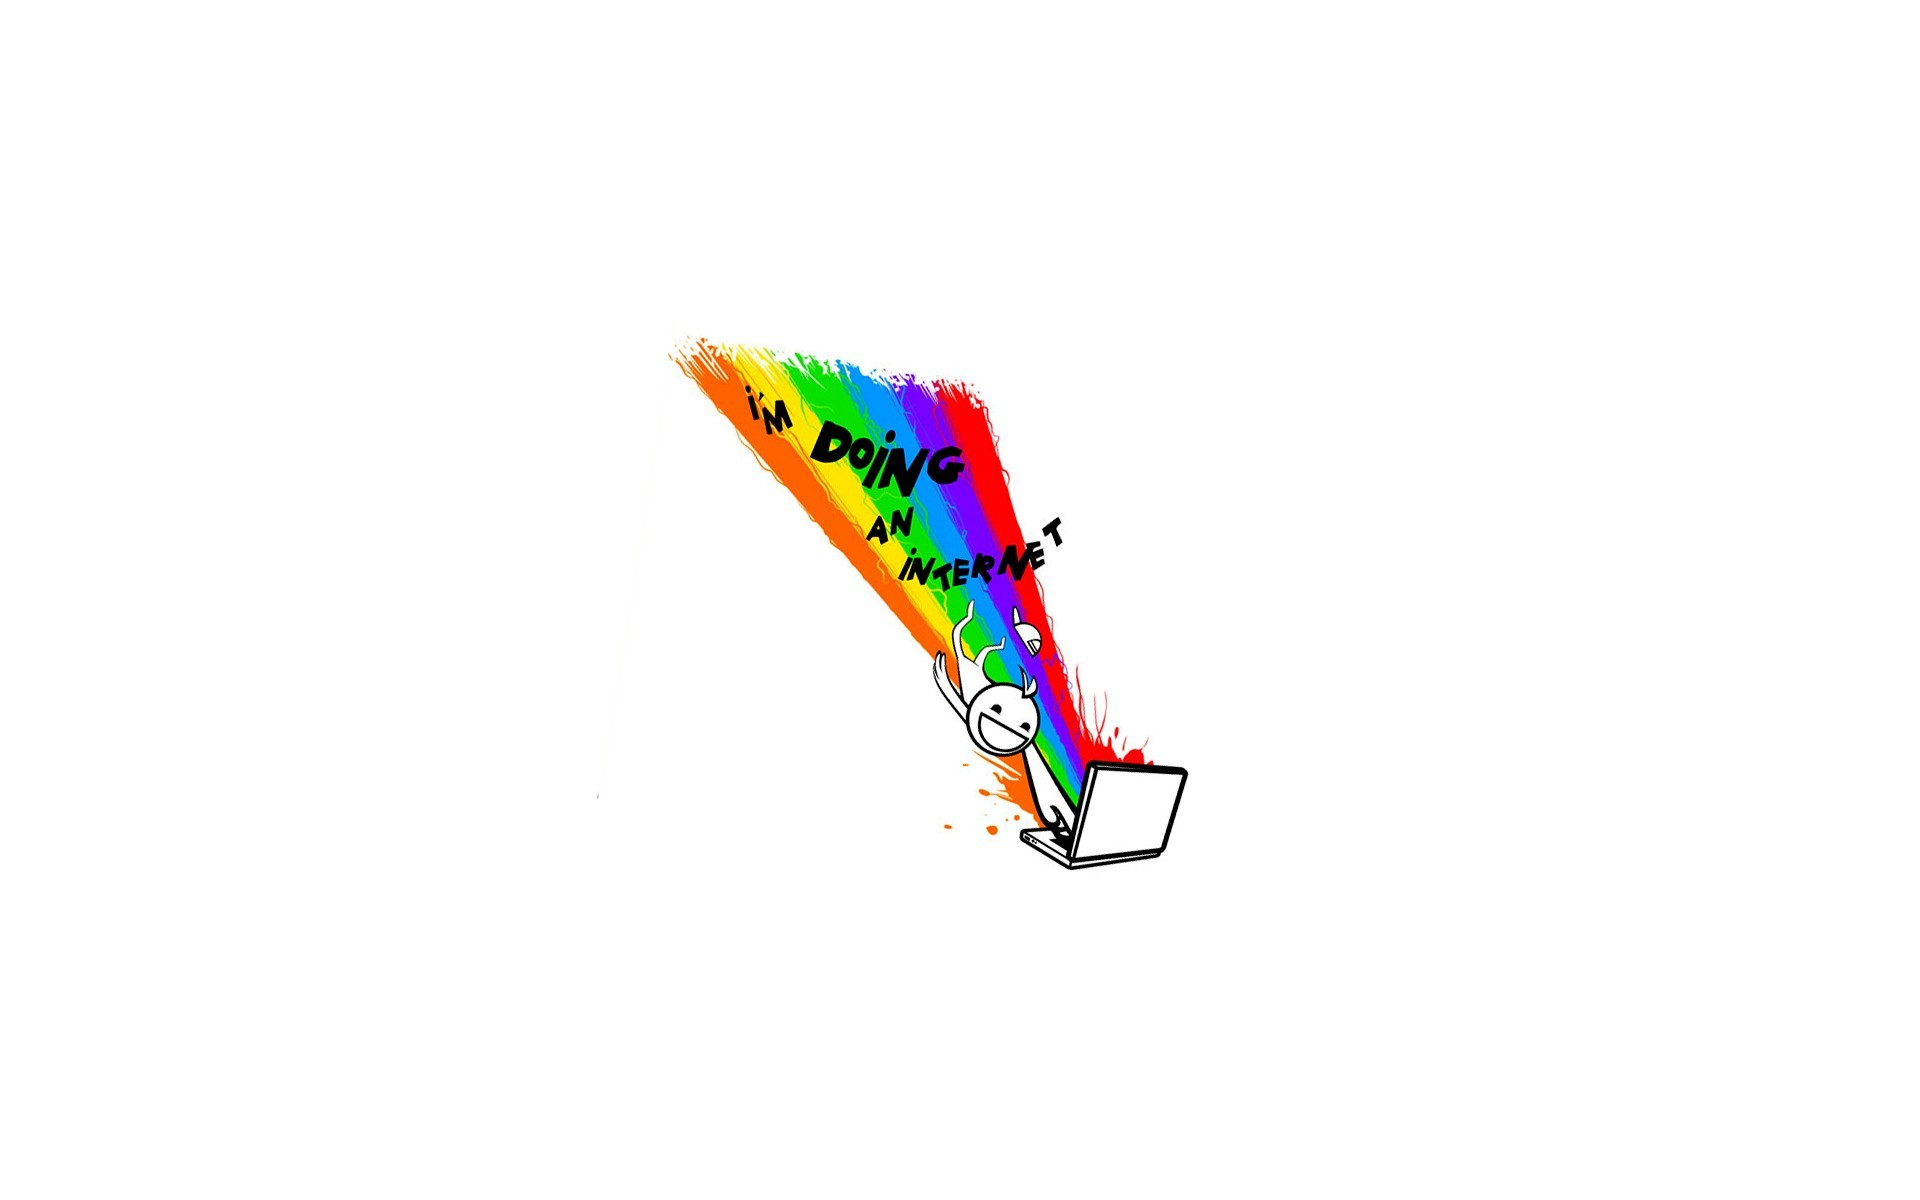 Funny Internet Meme Minimalistic Rainbows Text